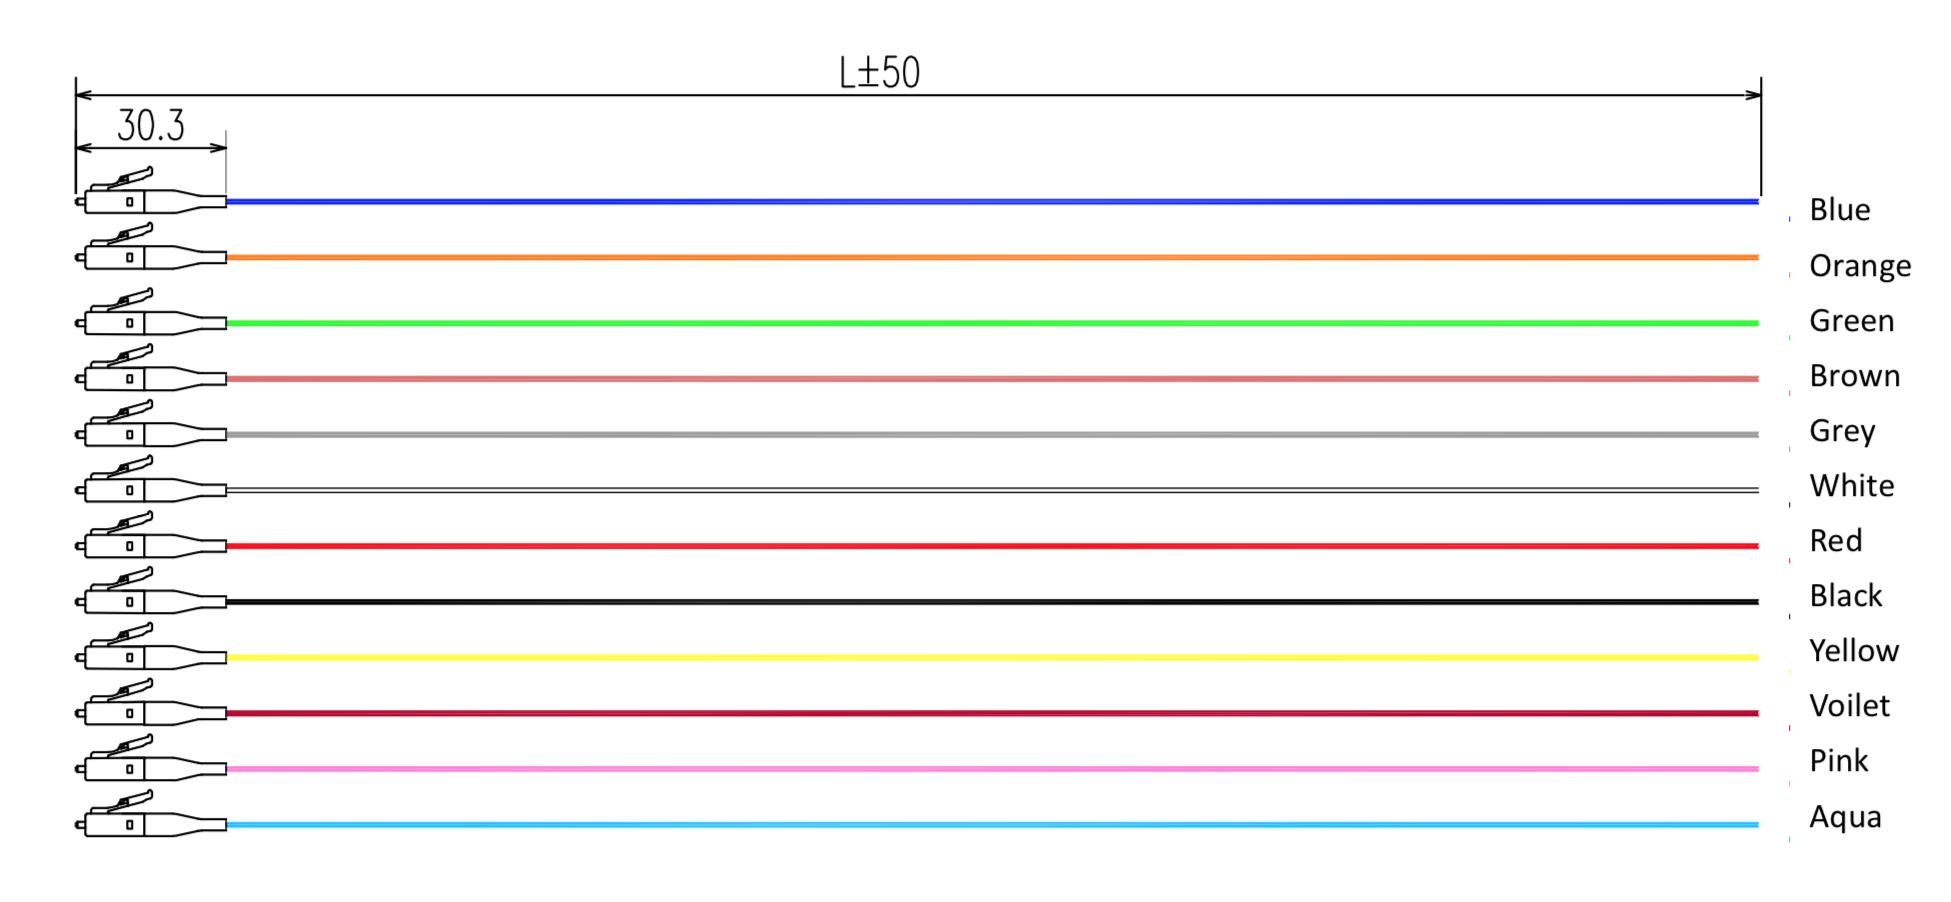 12 color-code fiber optic pigtail, 900um fiber cable assemblies